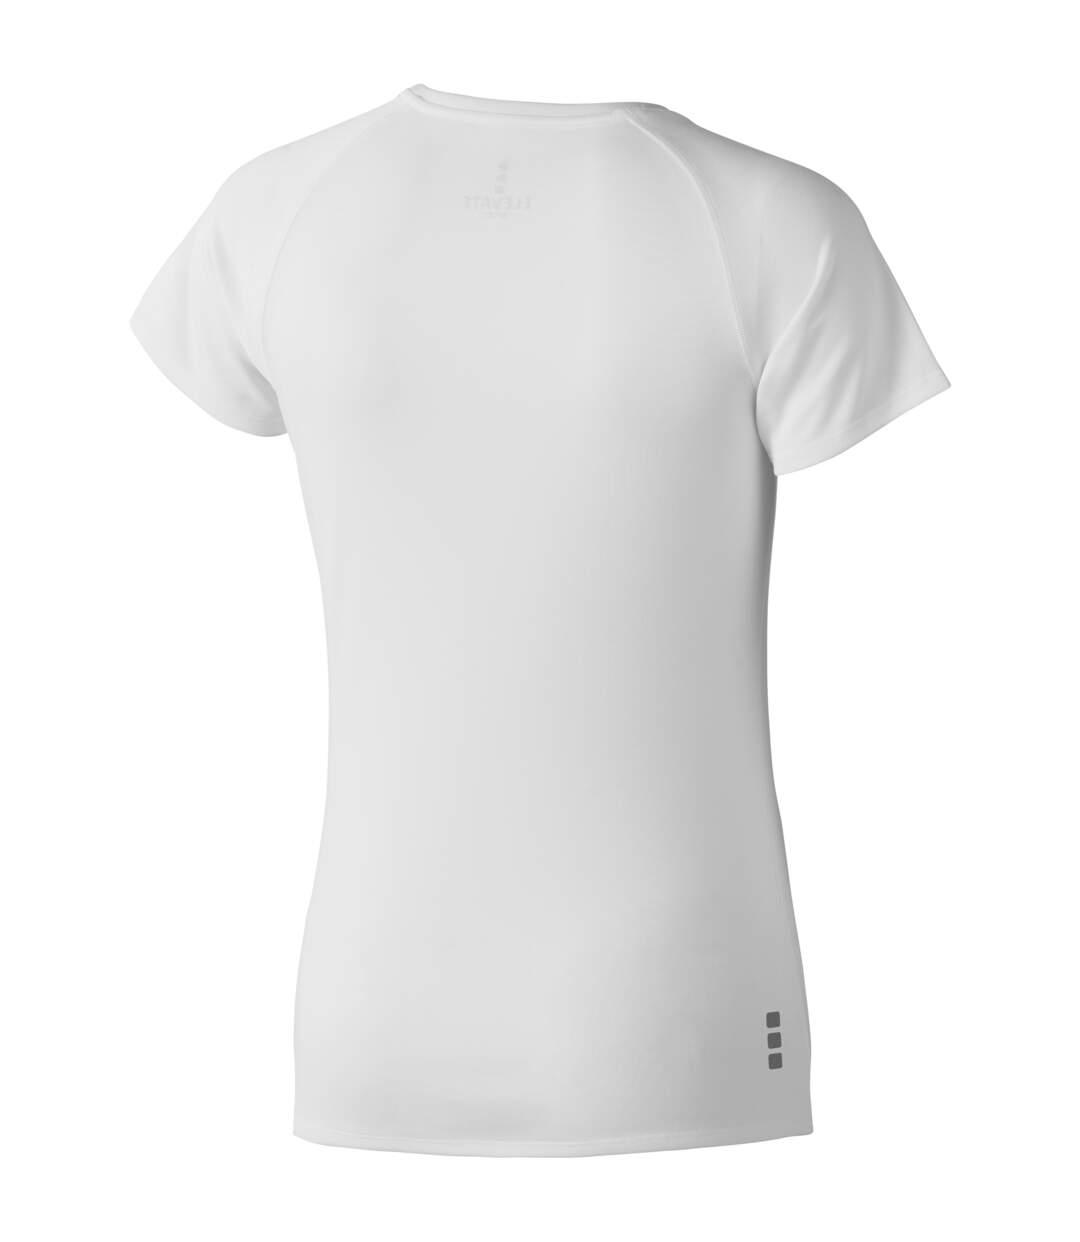 Elevate - T-Shirt Manches Courtes Niagara - Femme (Blanc) - UTPF1878